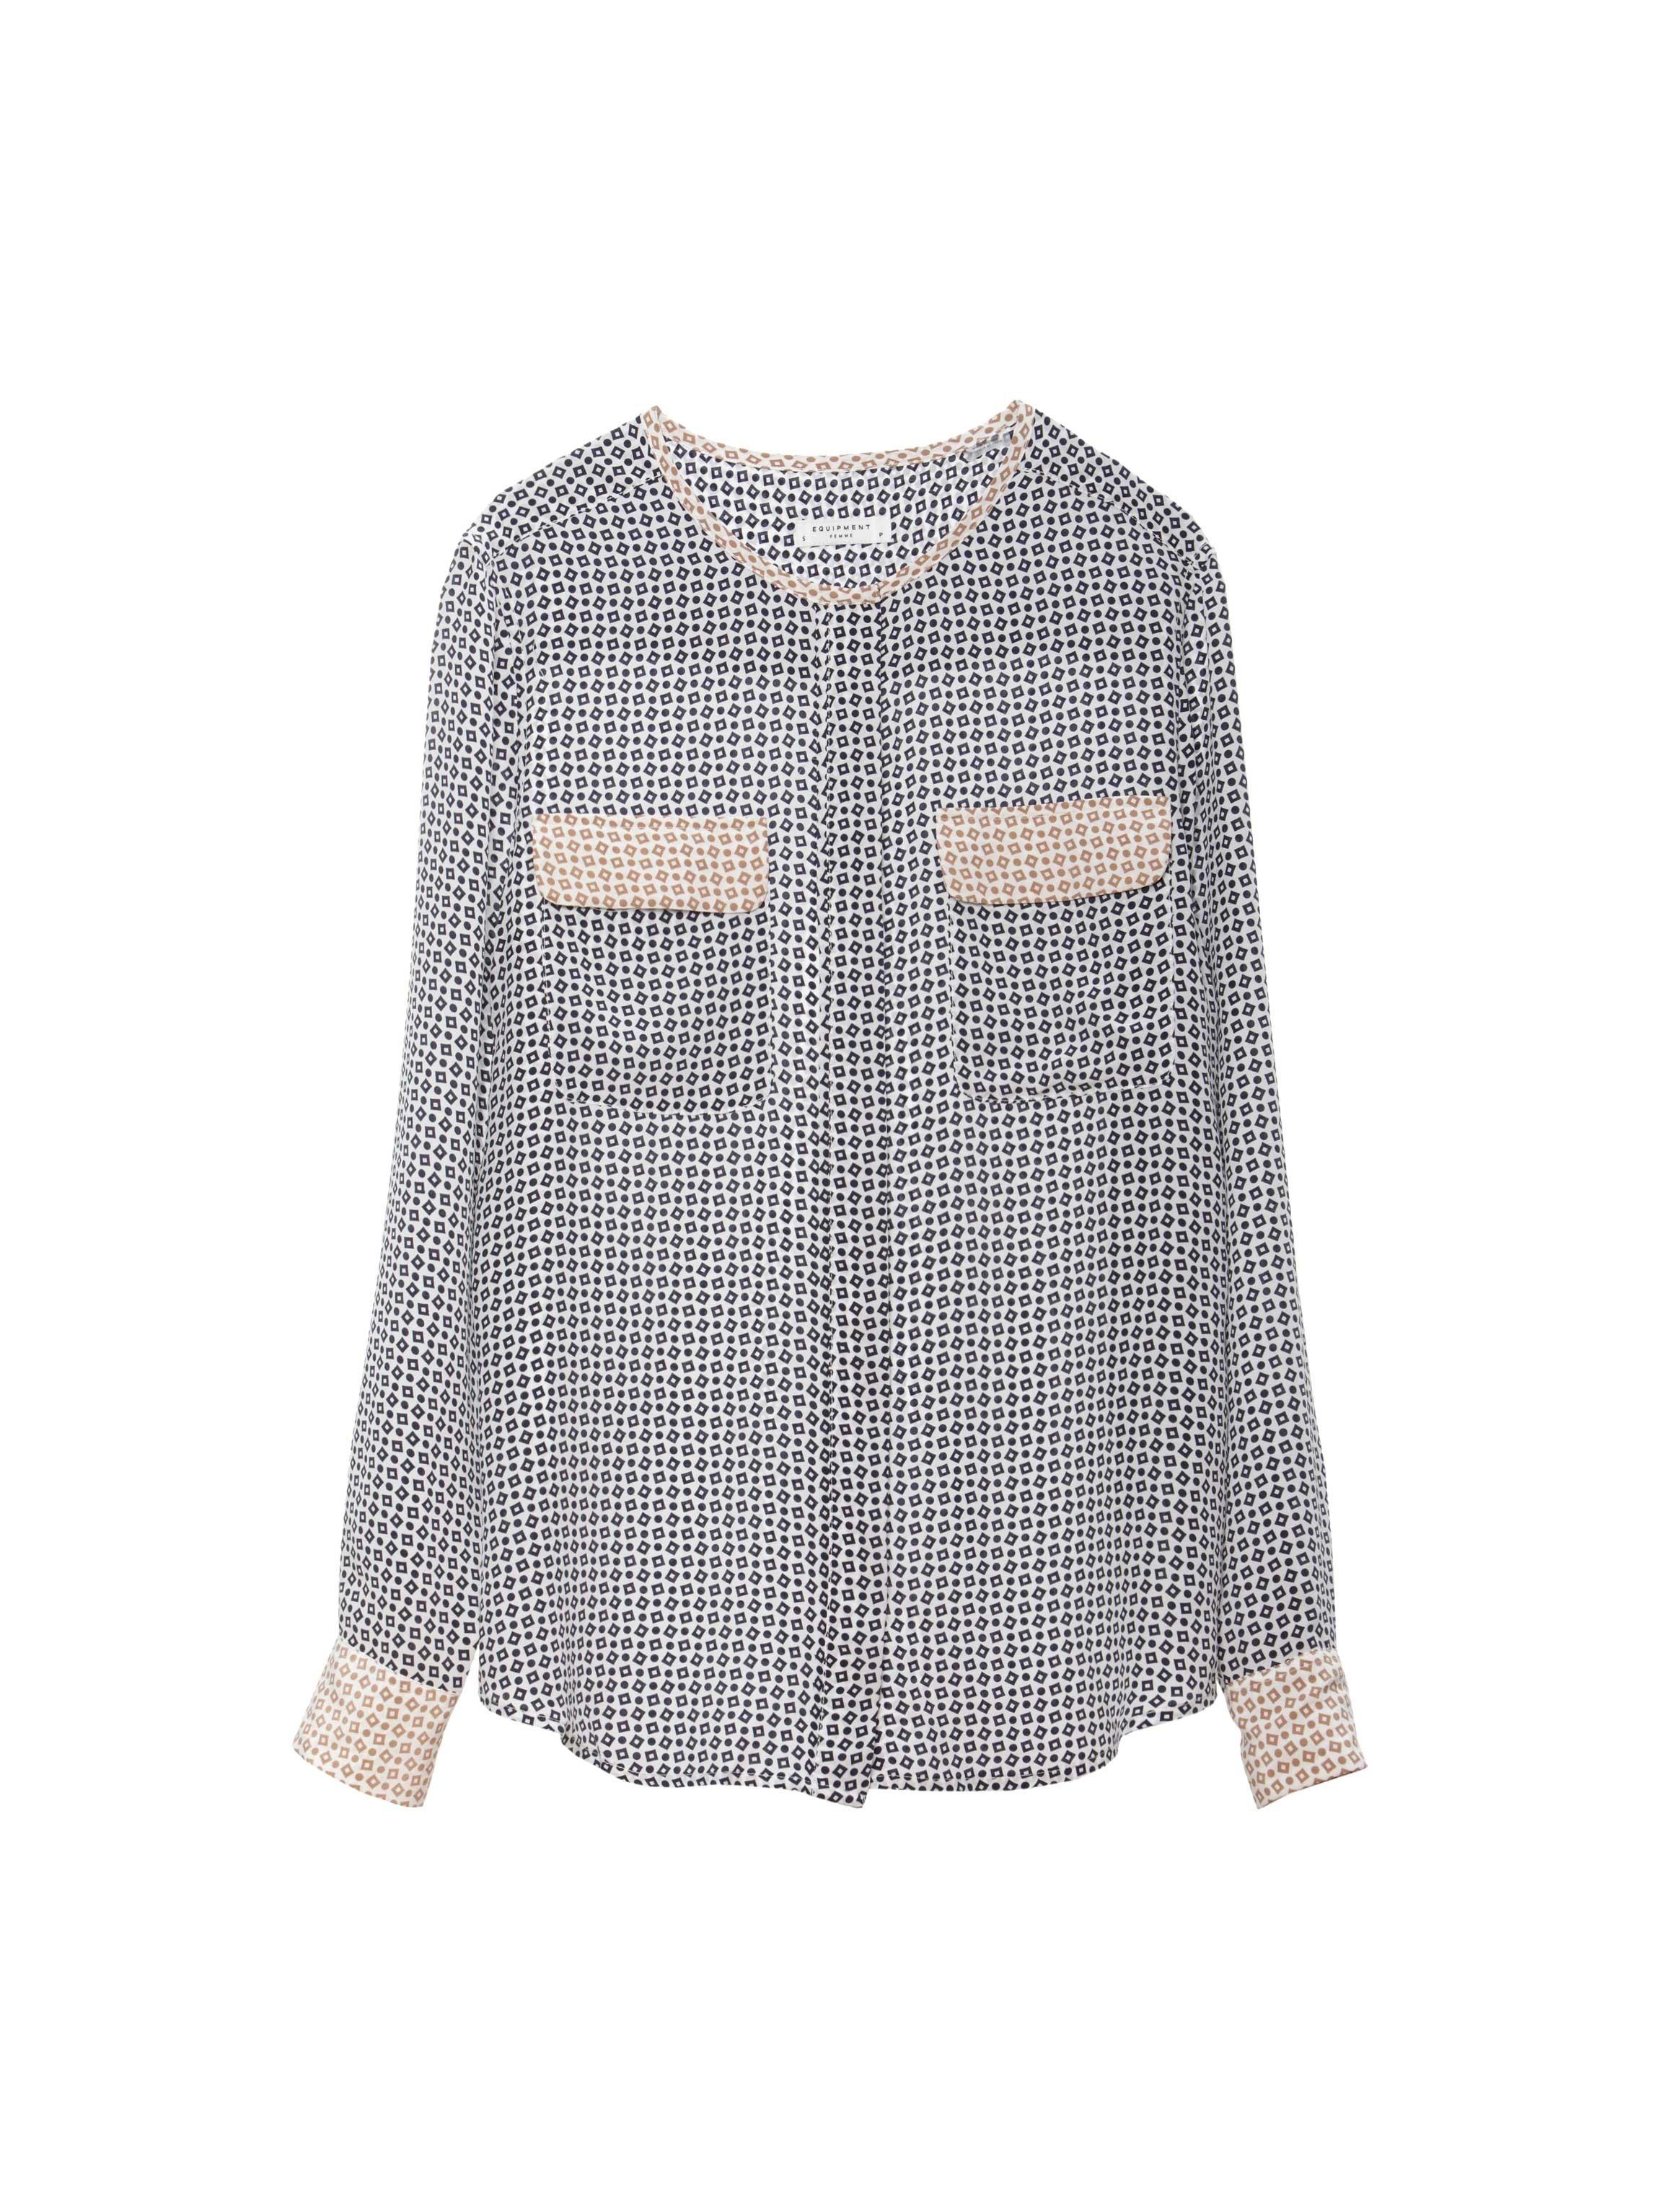 276fcff5fea4bf Equipment Slim Fit Silk Shirt In Pink Lyst